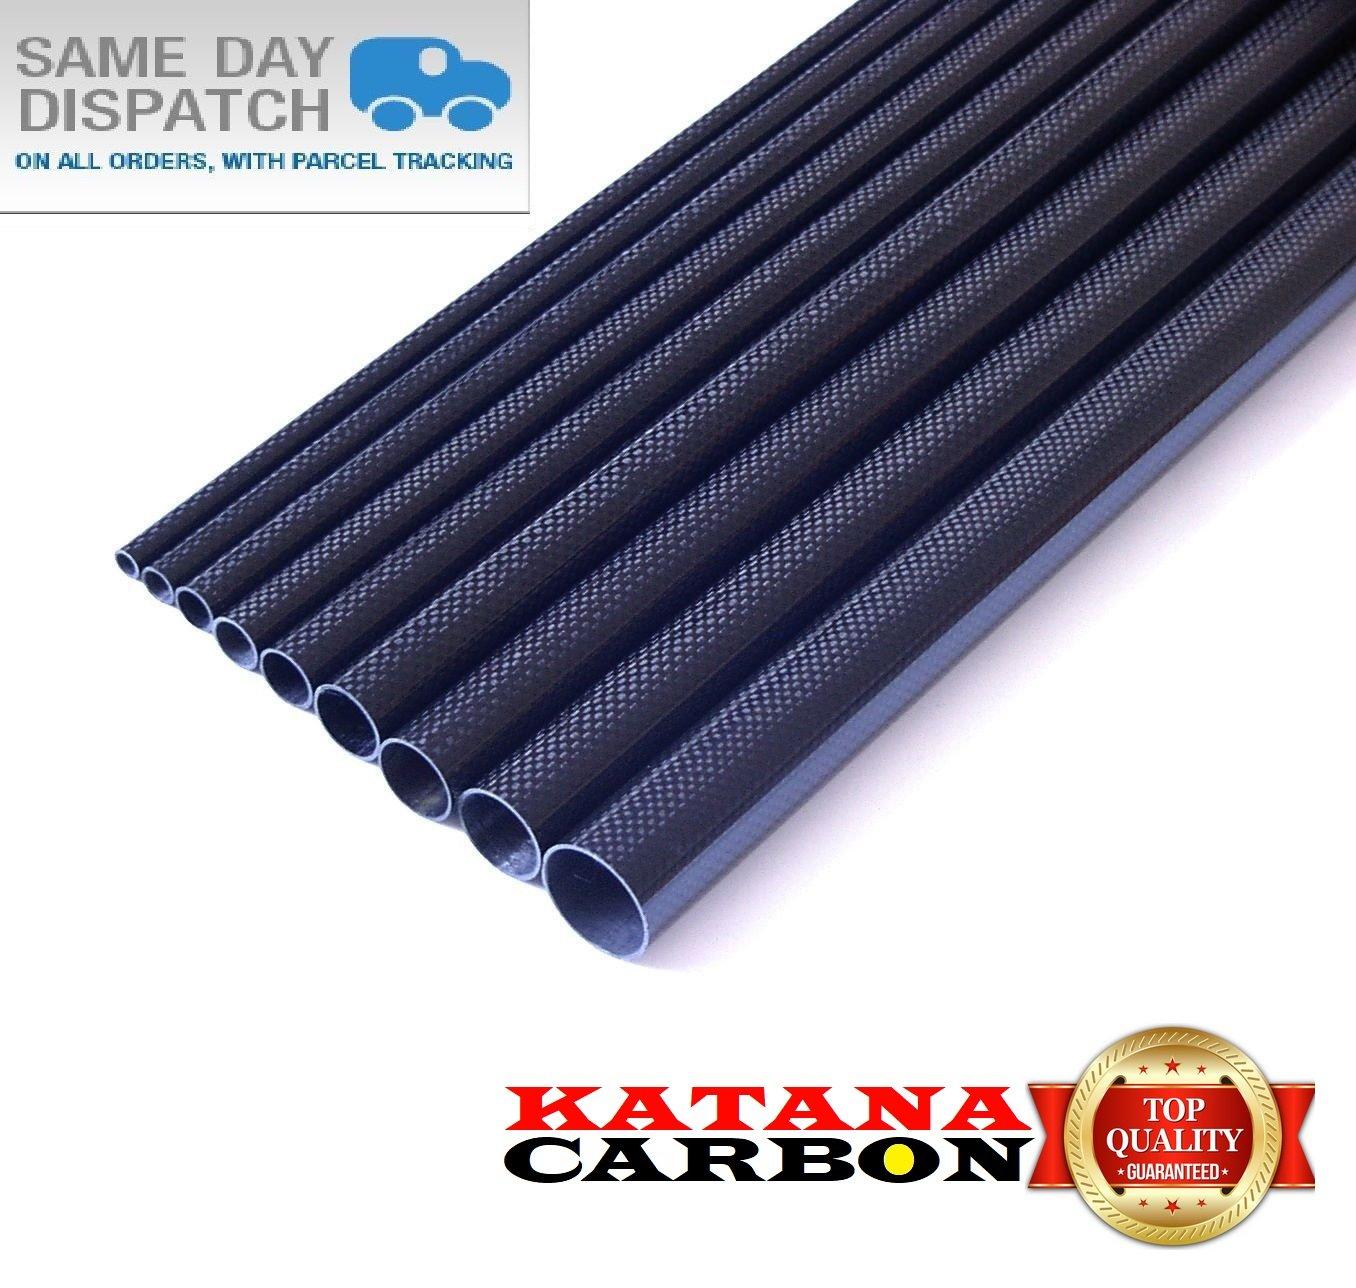 1x 40mm OD x 38mm ID x 800mm 3k Carbon Fibre Tube Roll-Wrapped